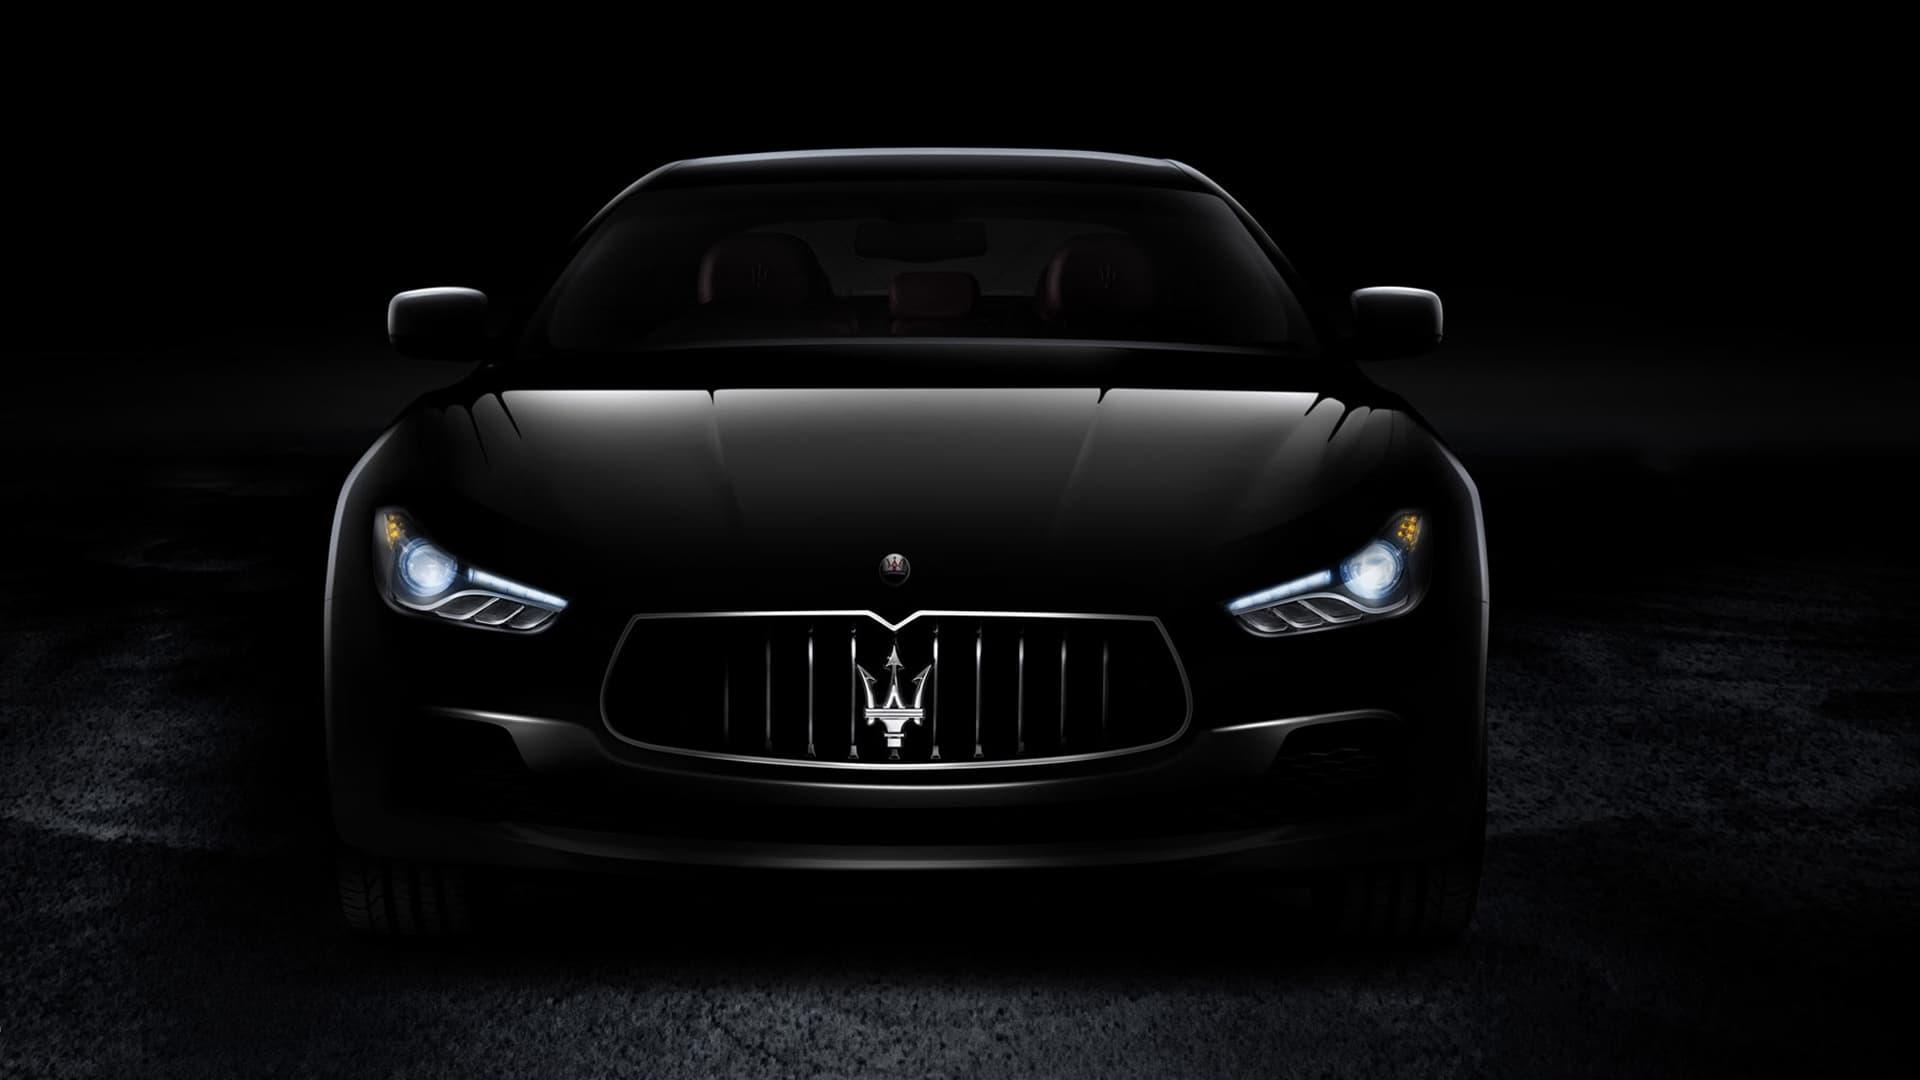 Best 35 Maserati Black Background on HipWallpaper Maserati Logo 1920x1080